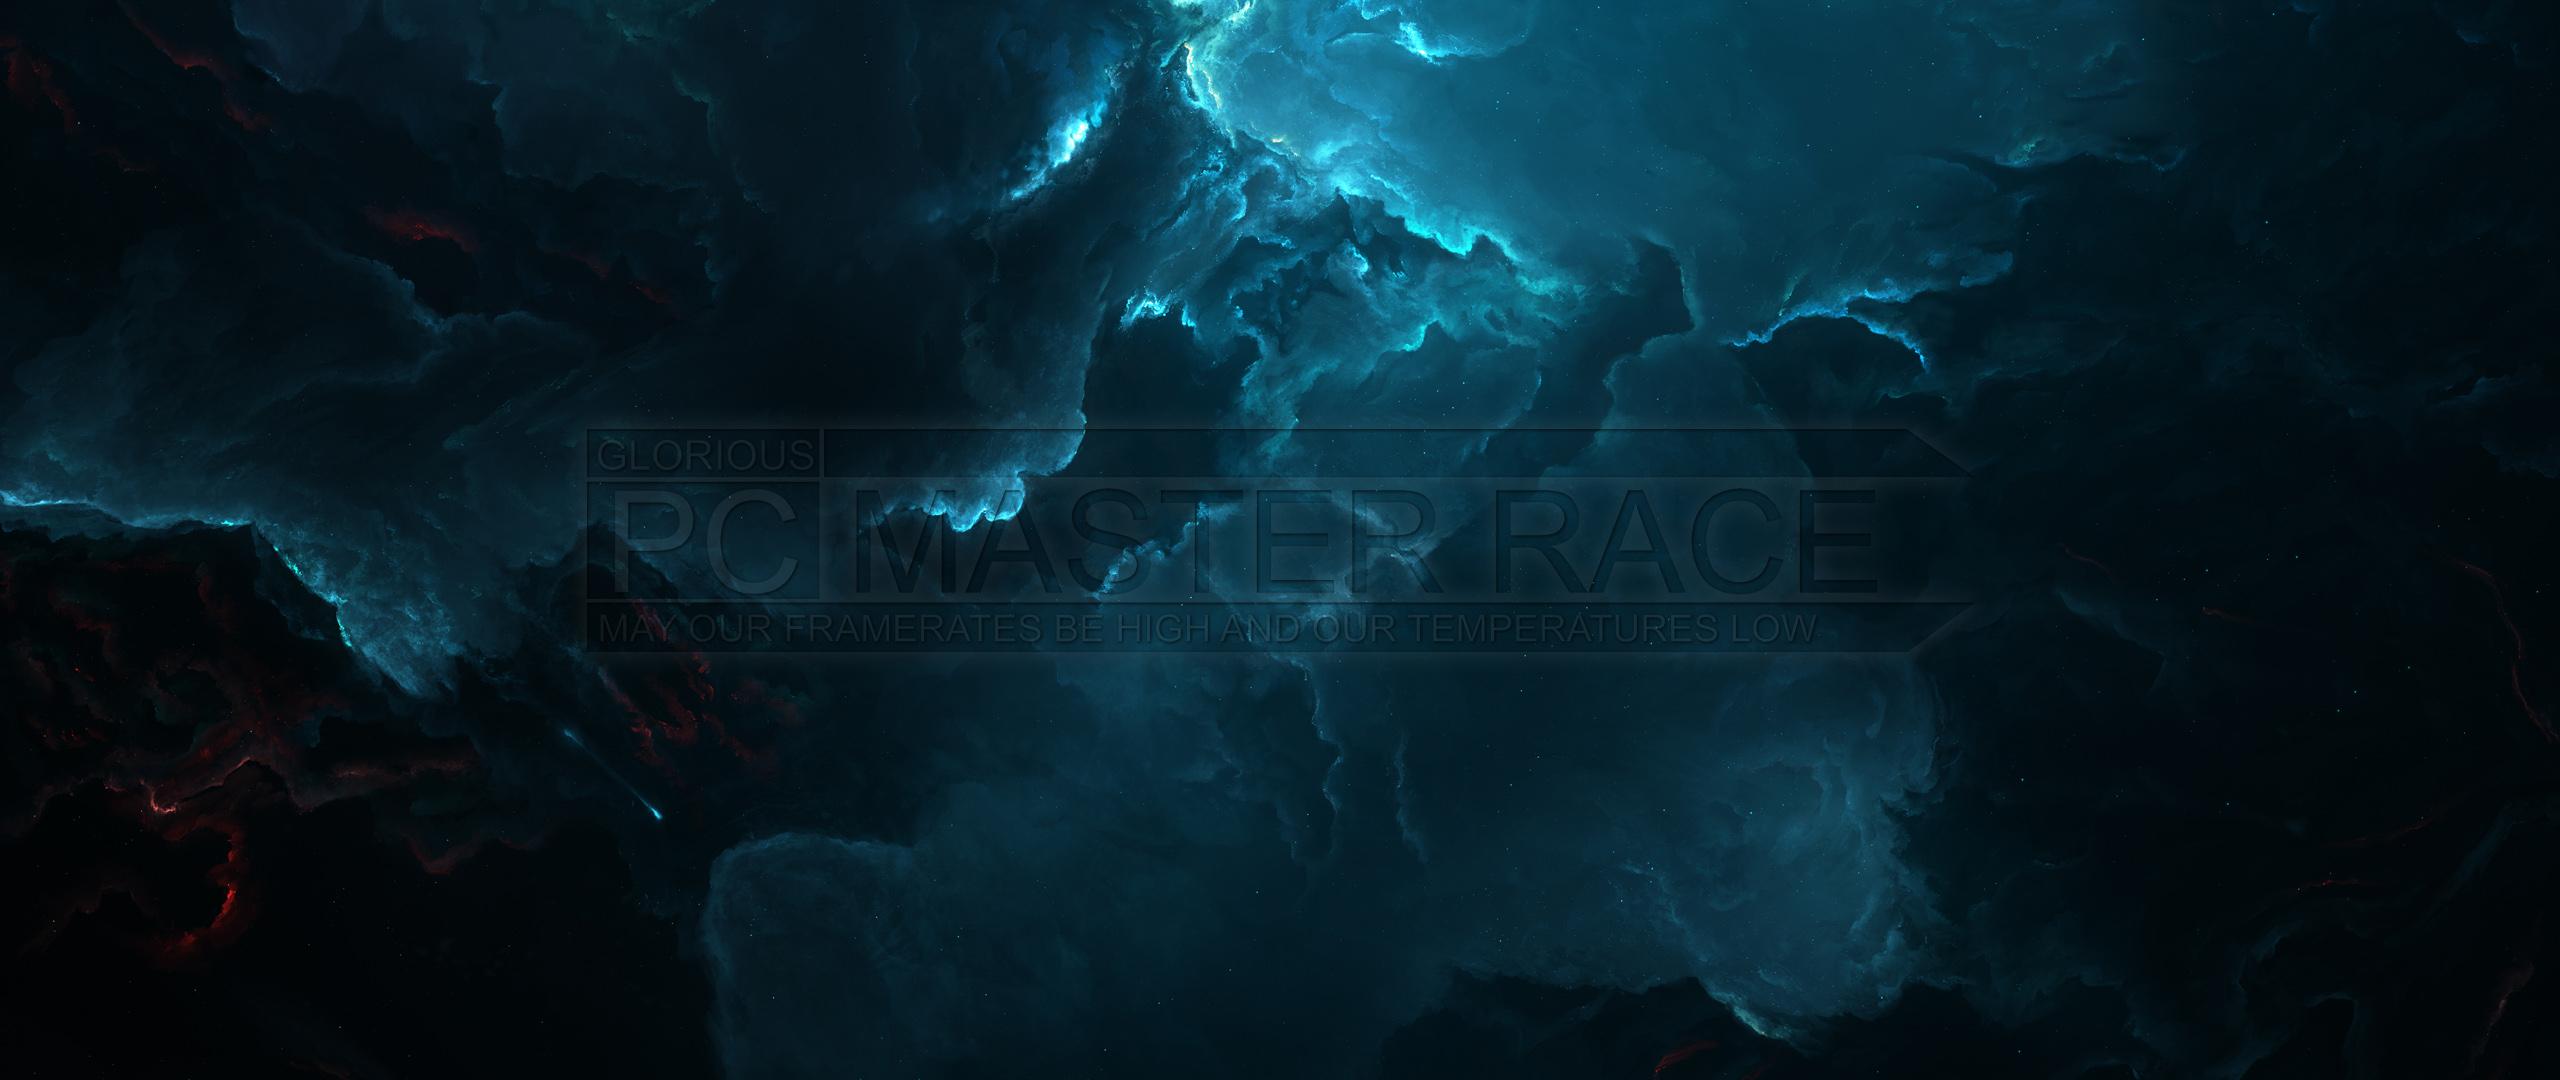 Pc Master Race Ultrawide Wallpaper By Nidrax On Deviantart